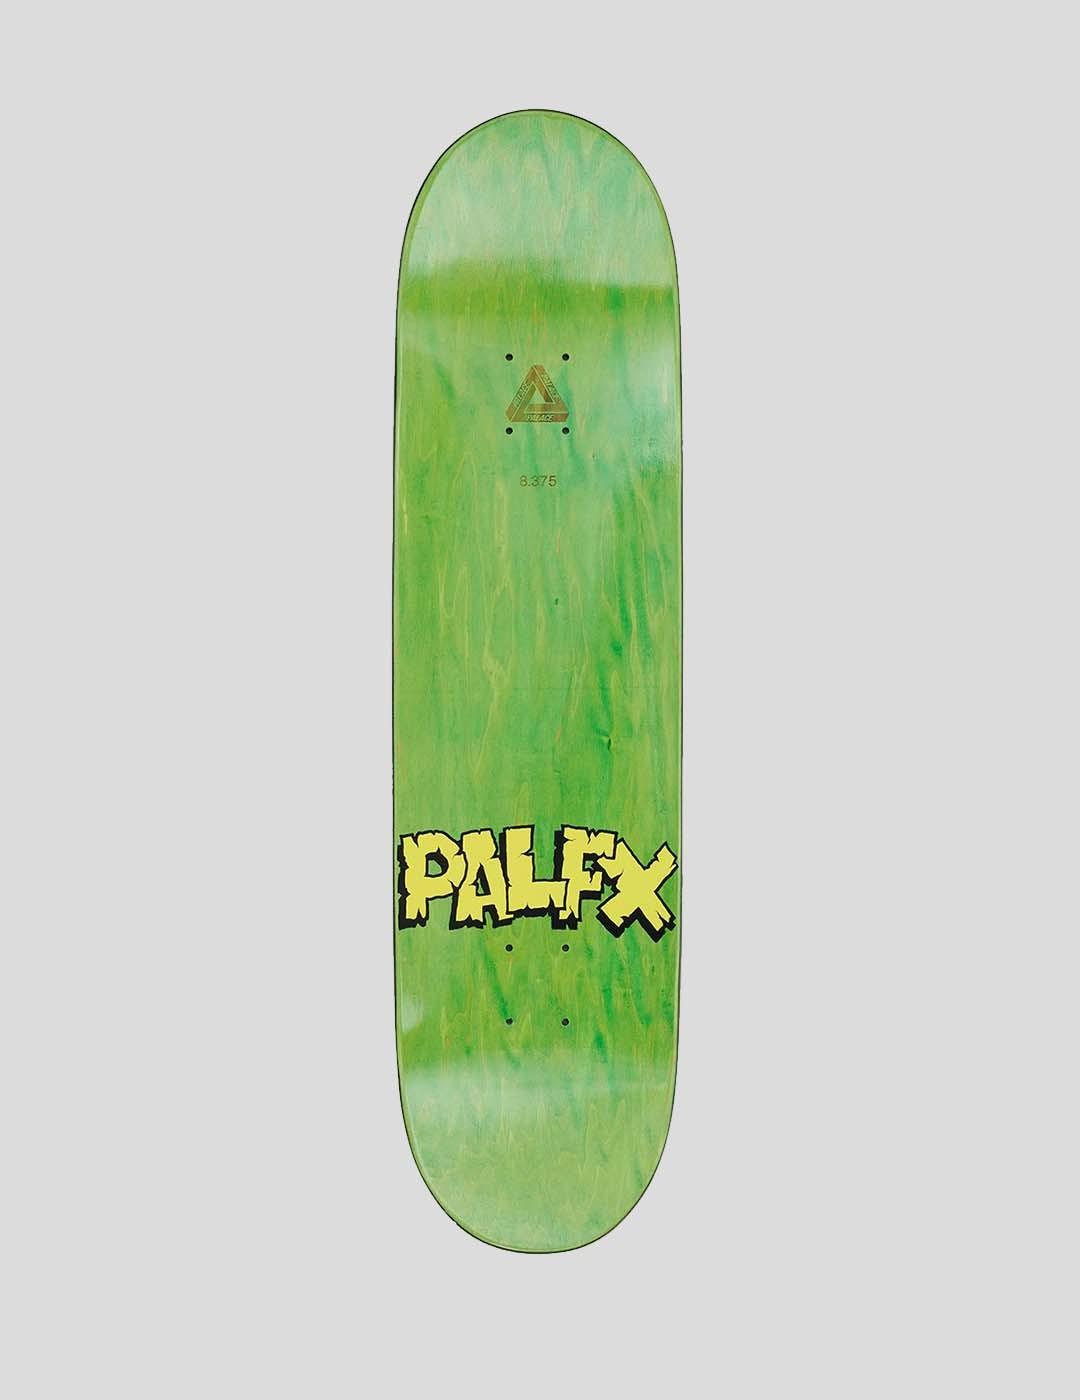 "TABLA PALACE PALFX WHITE 8.375"" DECK"